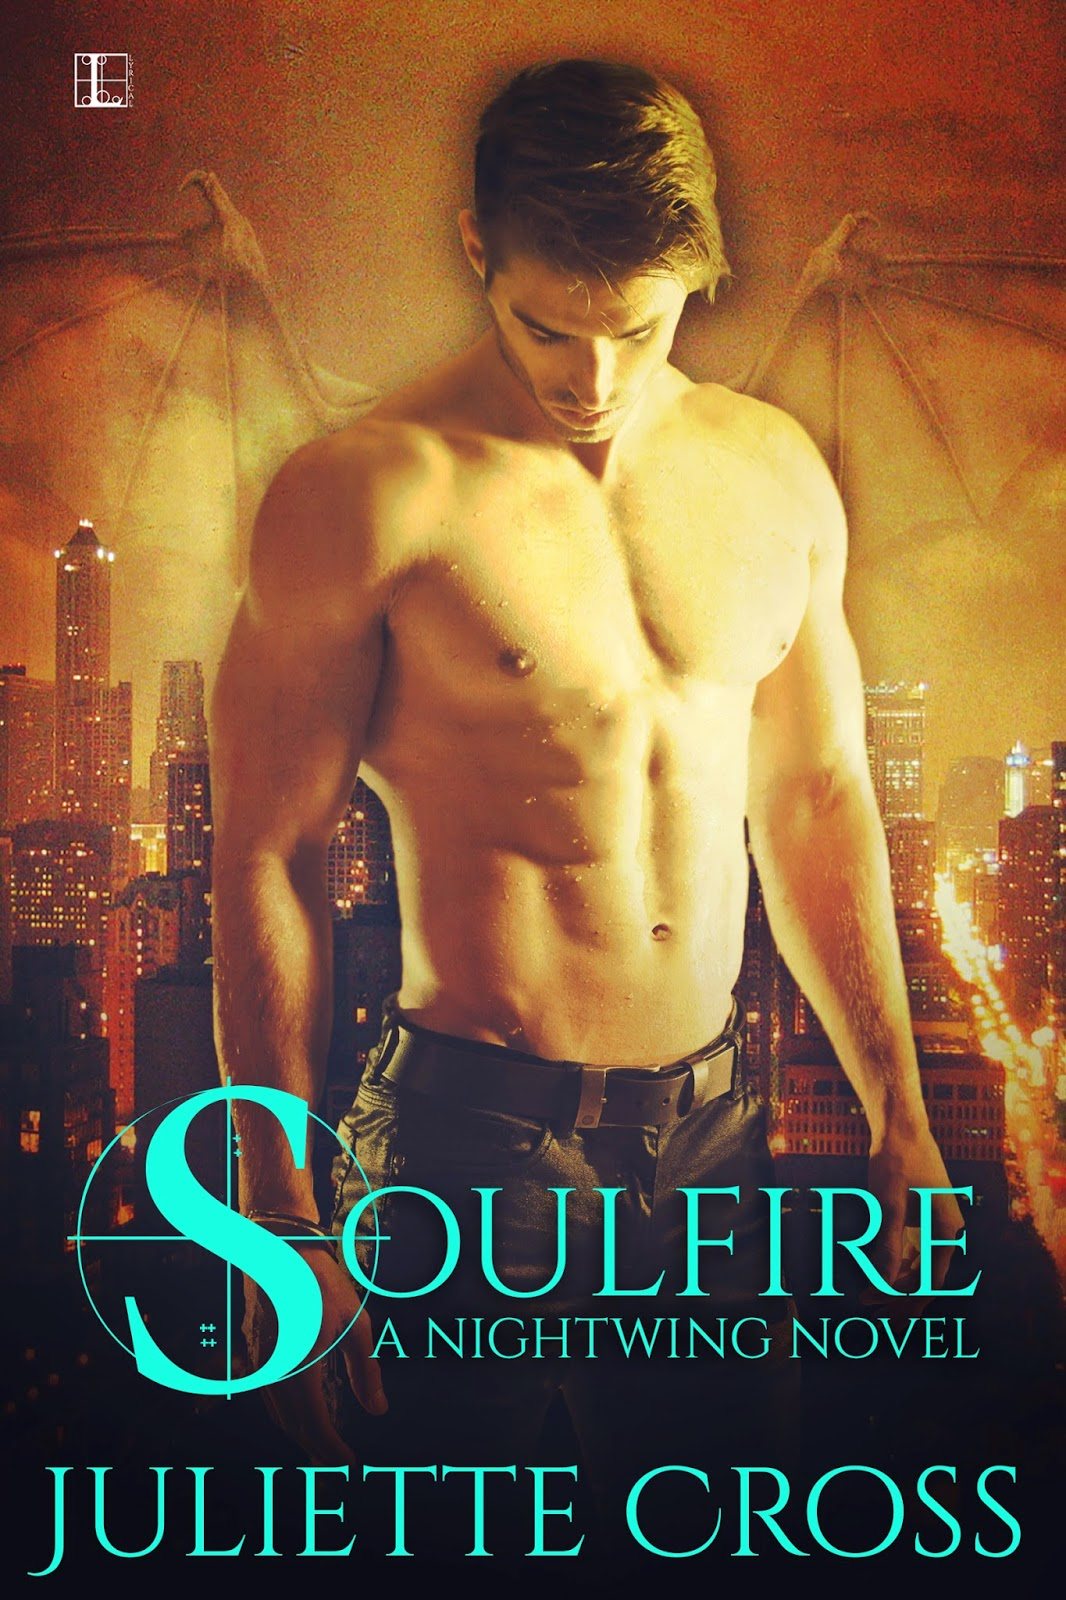 http://www.amazon.com/Soulfire-Nightwing-Juliette-Cross-ebook/dp/B00MMMGY1S/ref=cm_cr_pr_product_top?ie=UTF8